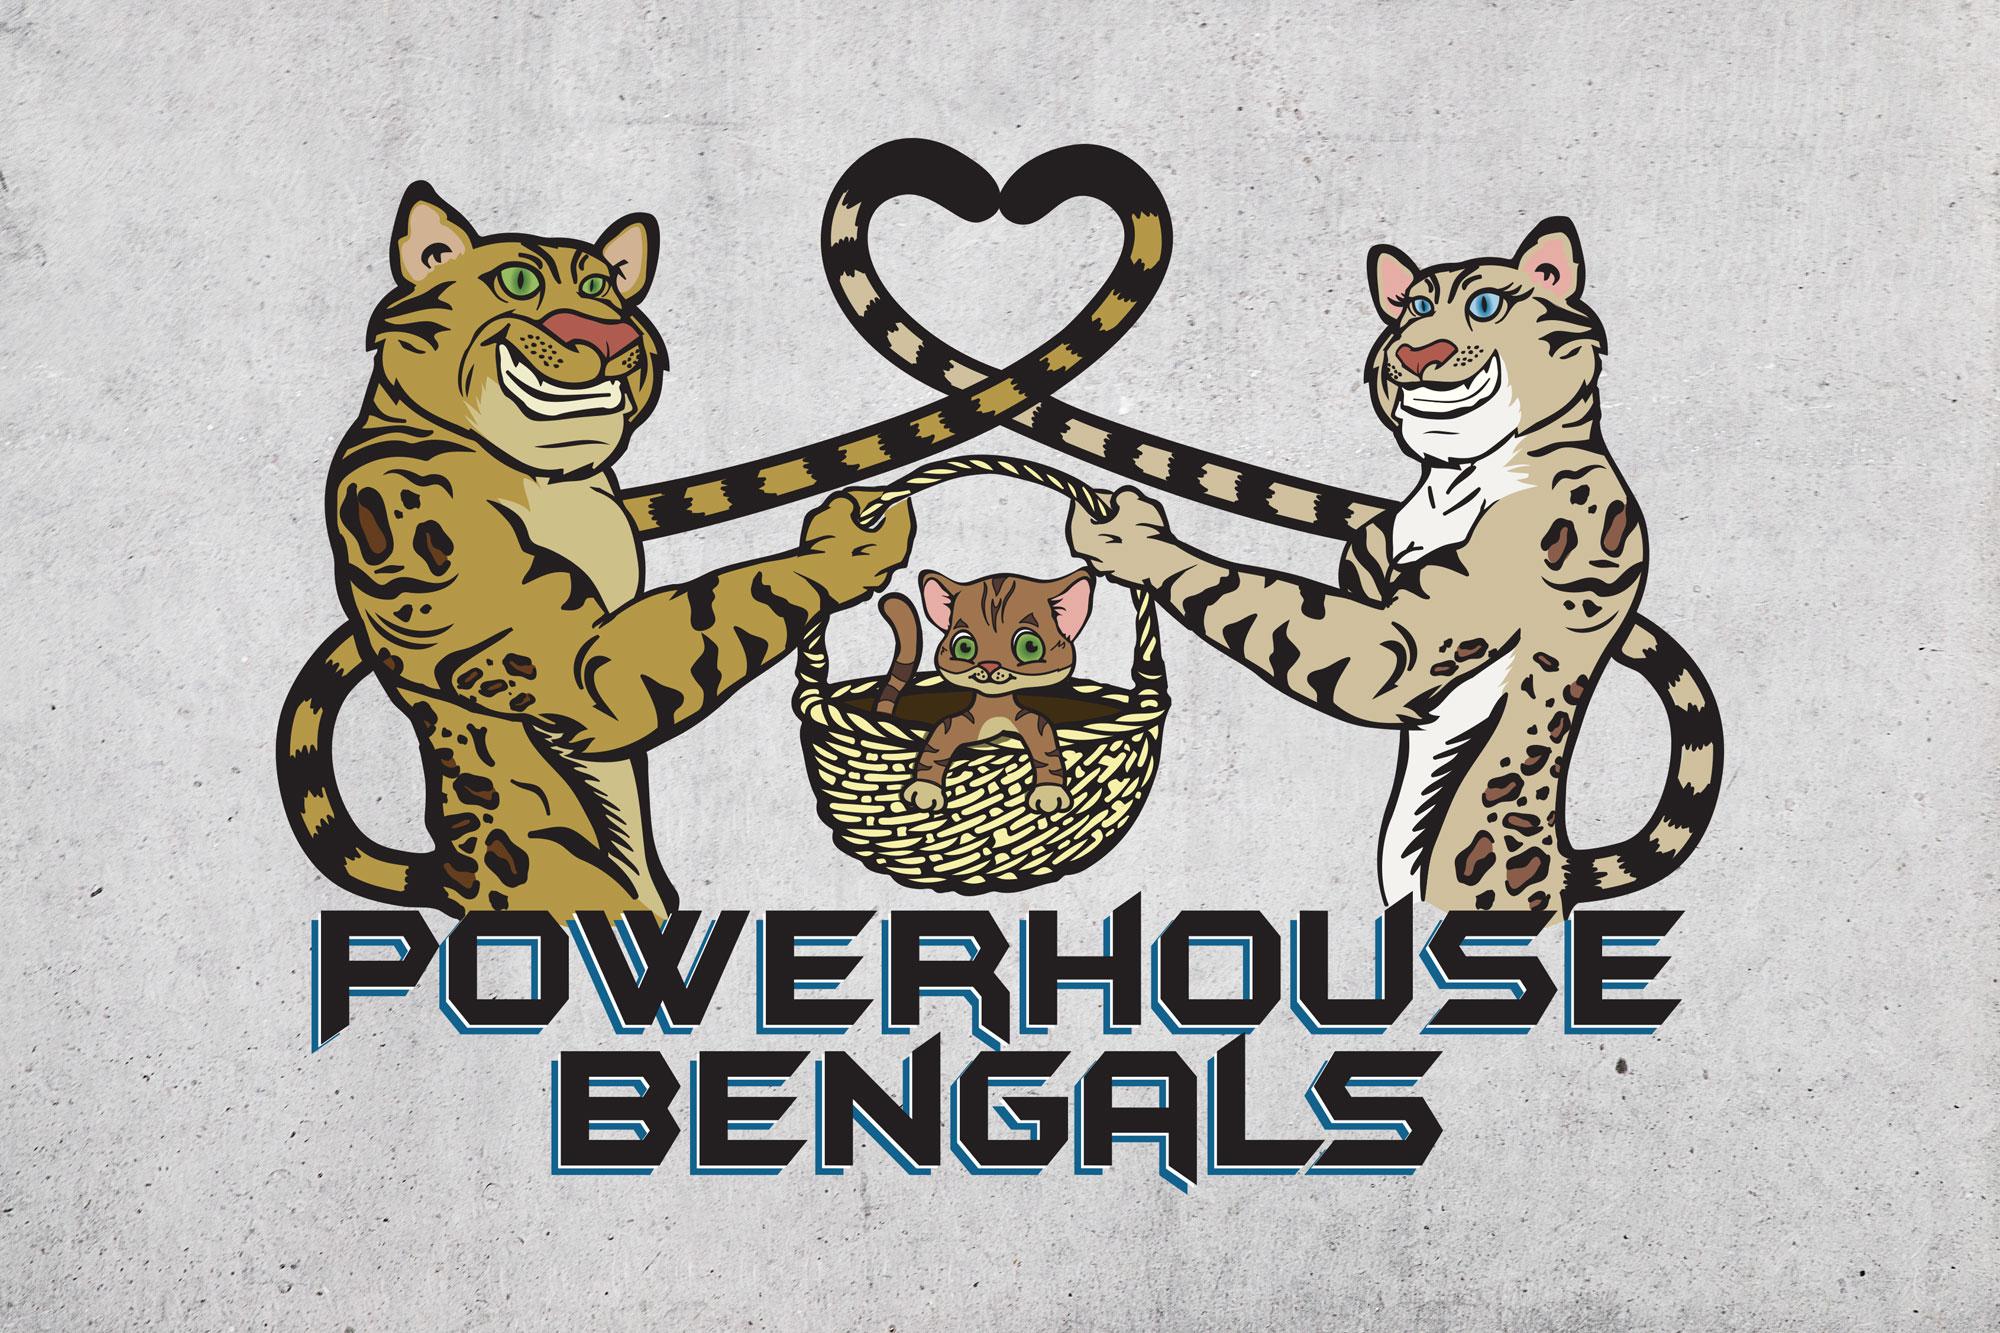 Powerhouse Bengals Illustrated Brand